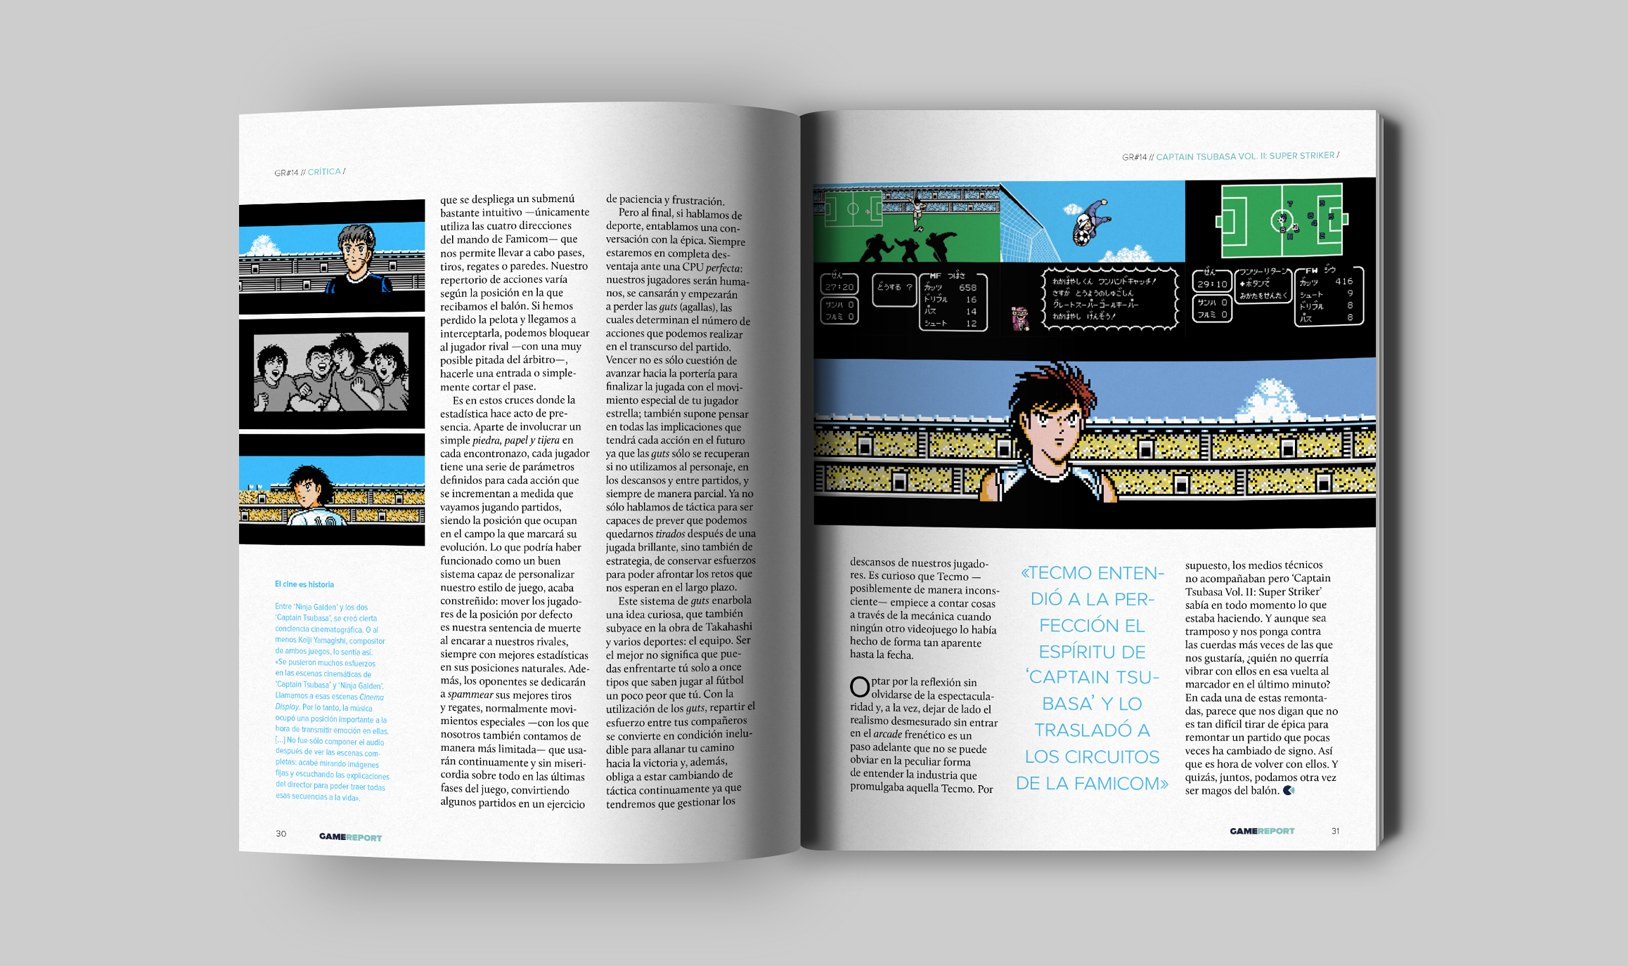 Captain Tsubasa - GameReport #14